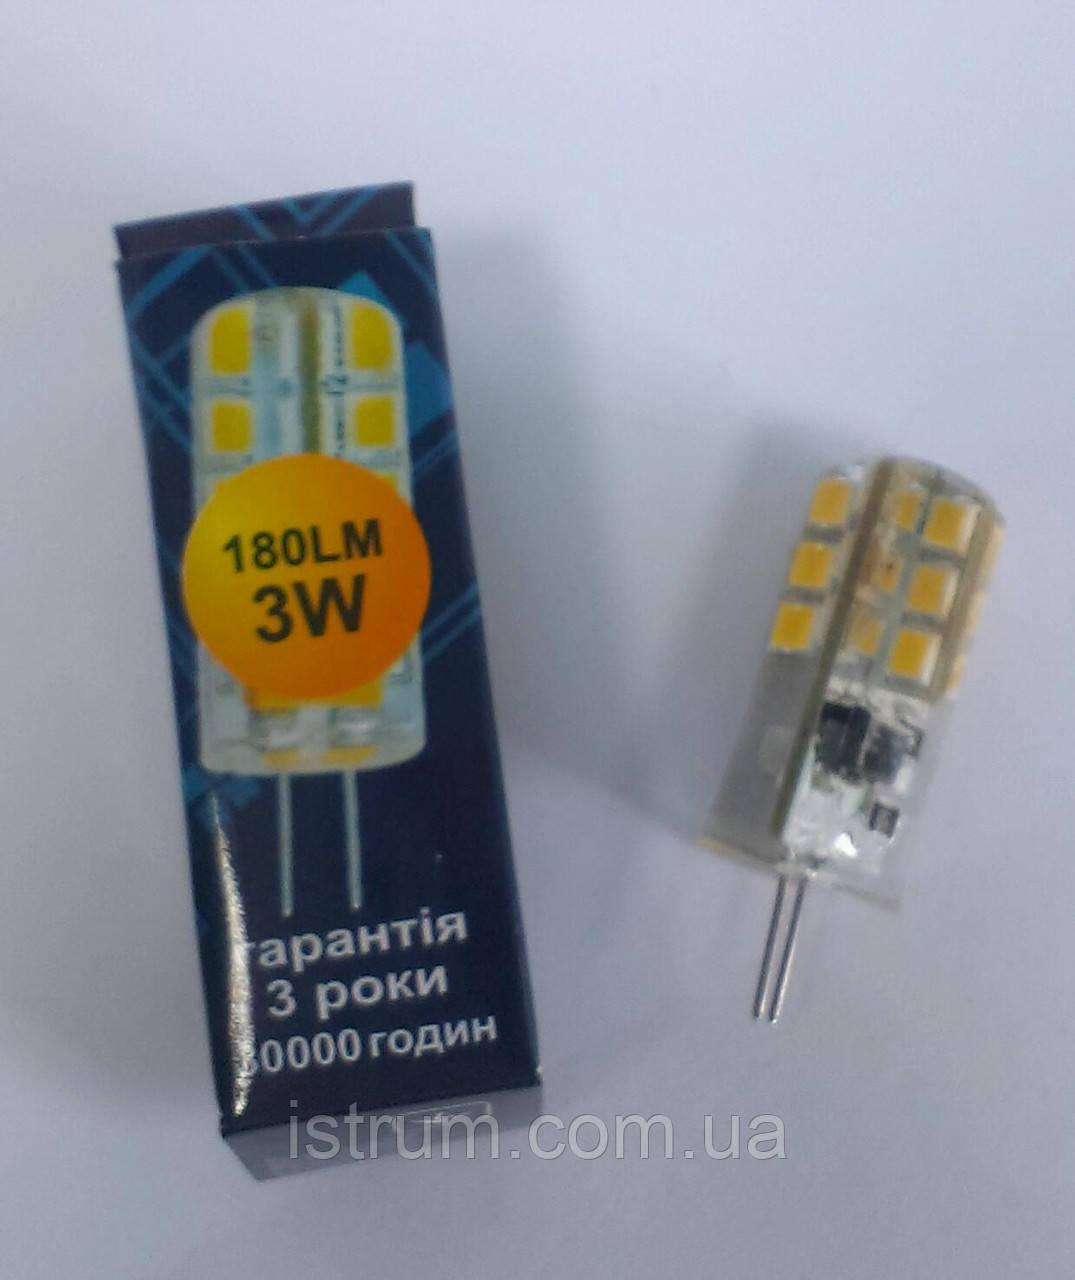 Лампа светодиодная 3W G4 180Lm 300* 4000K AC/DC 12V, Numina